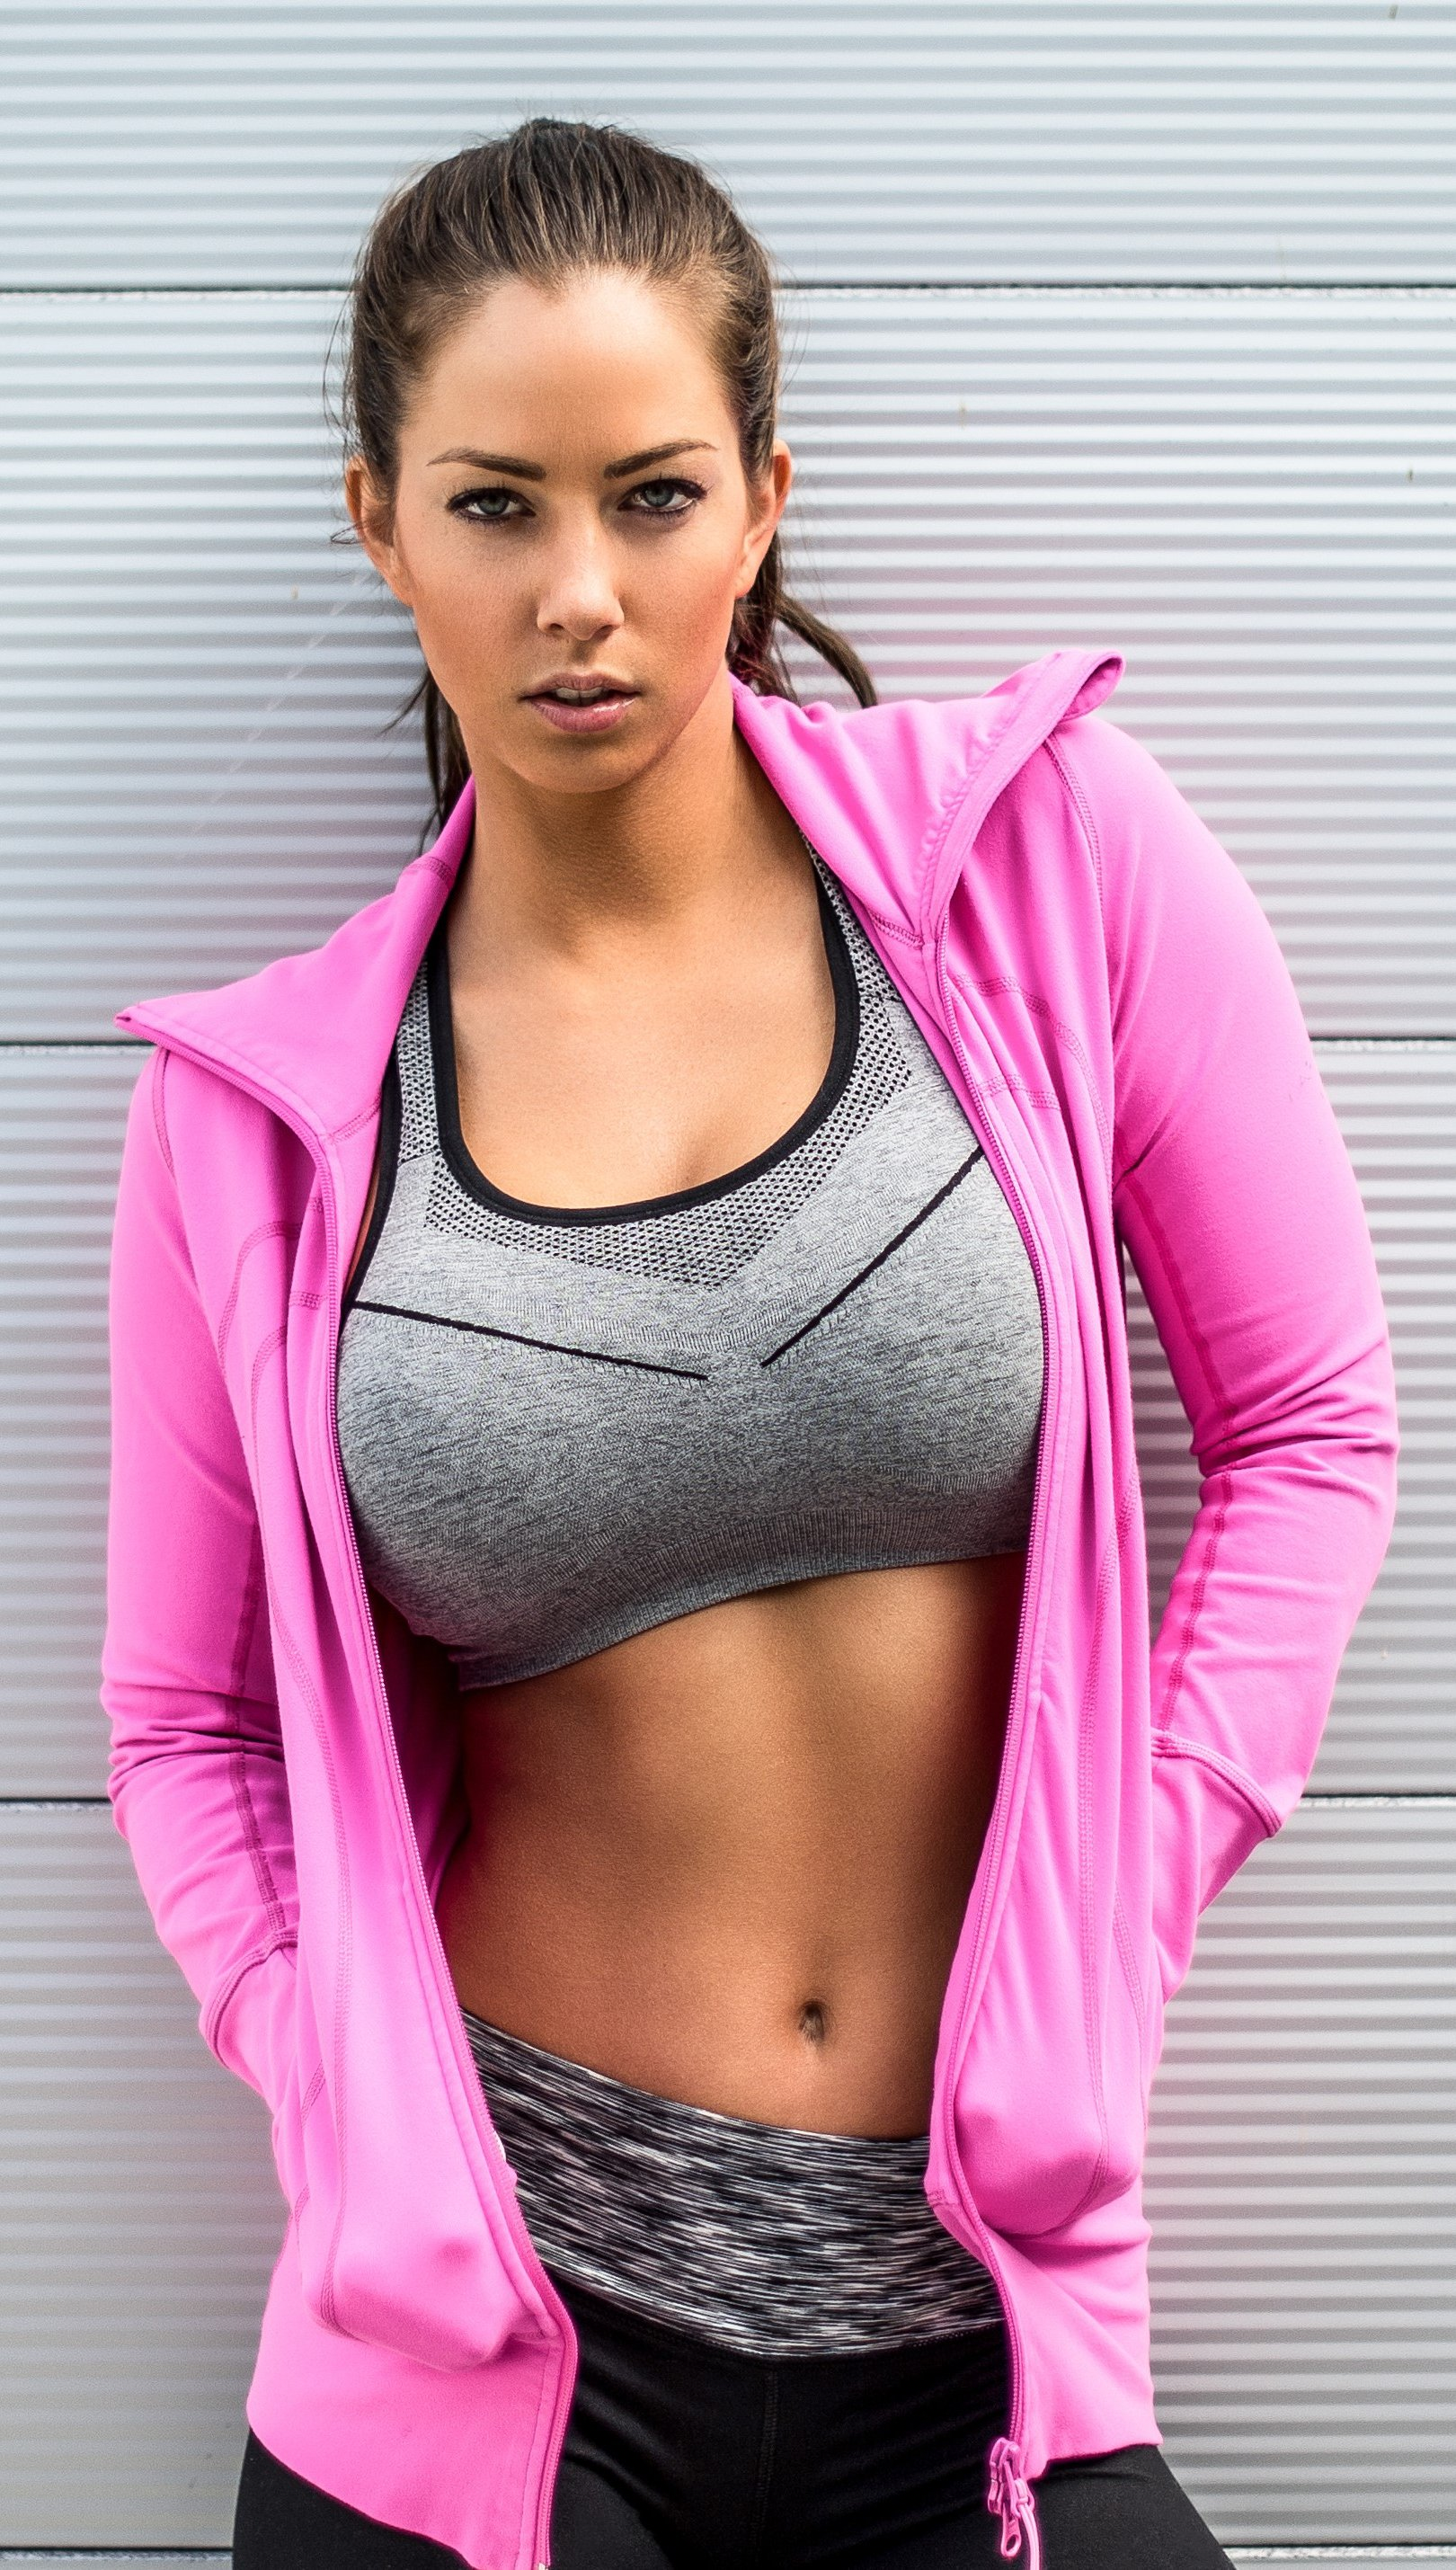 Wallpaper Janna Breslin Fitness Vertical